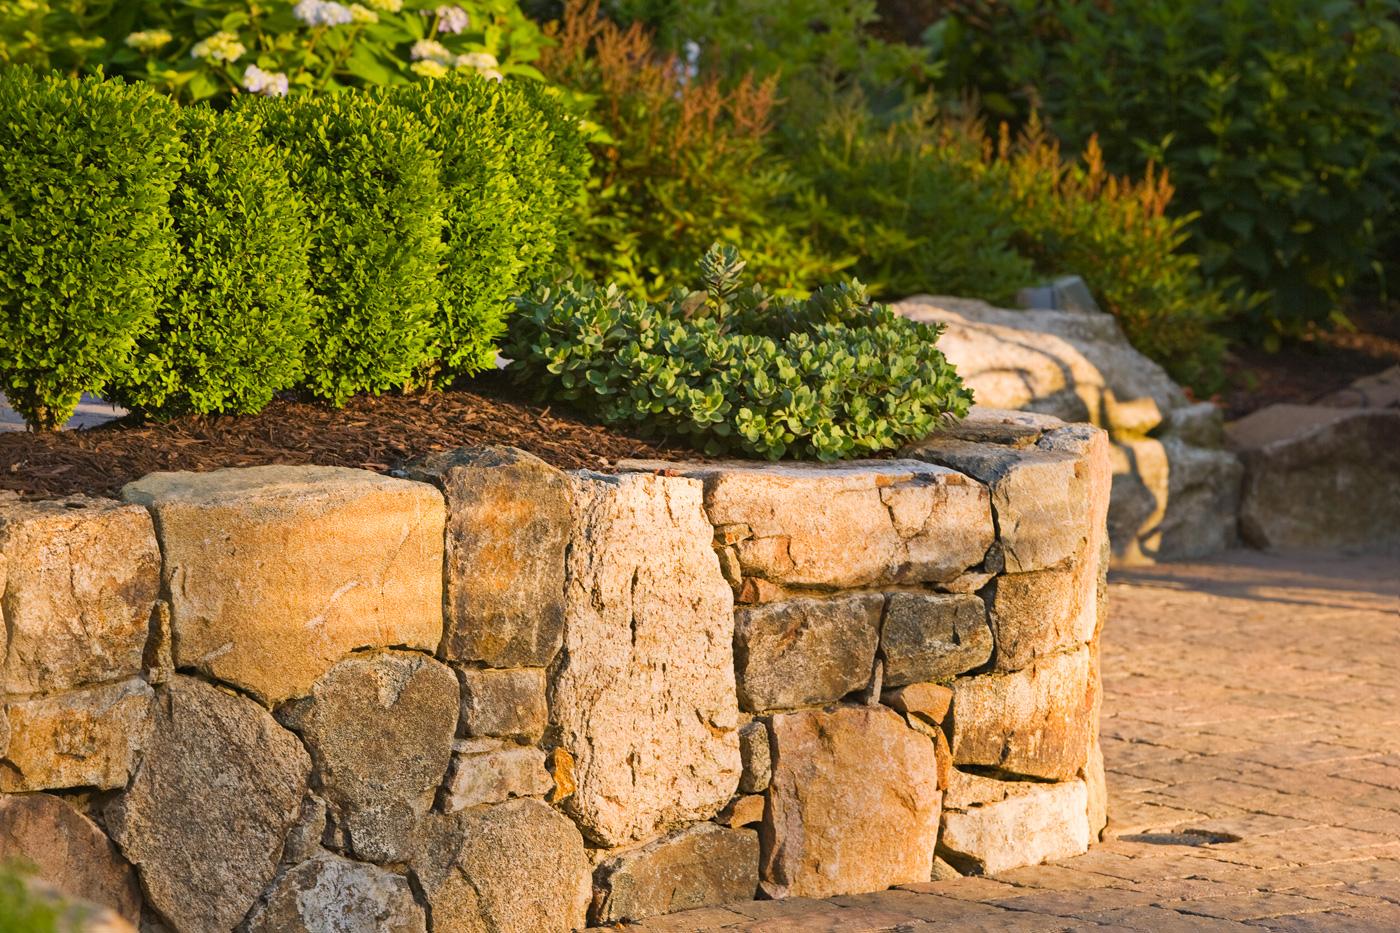 Landscaping Natural Stone : Natural stone retaining walls cording landscape design